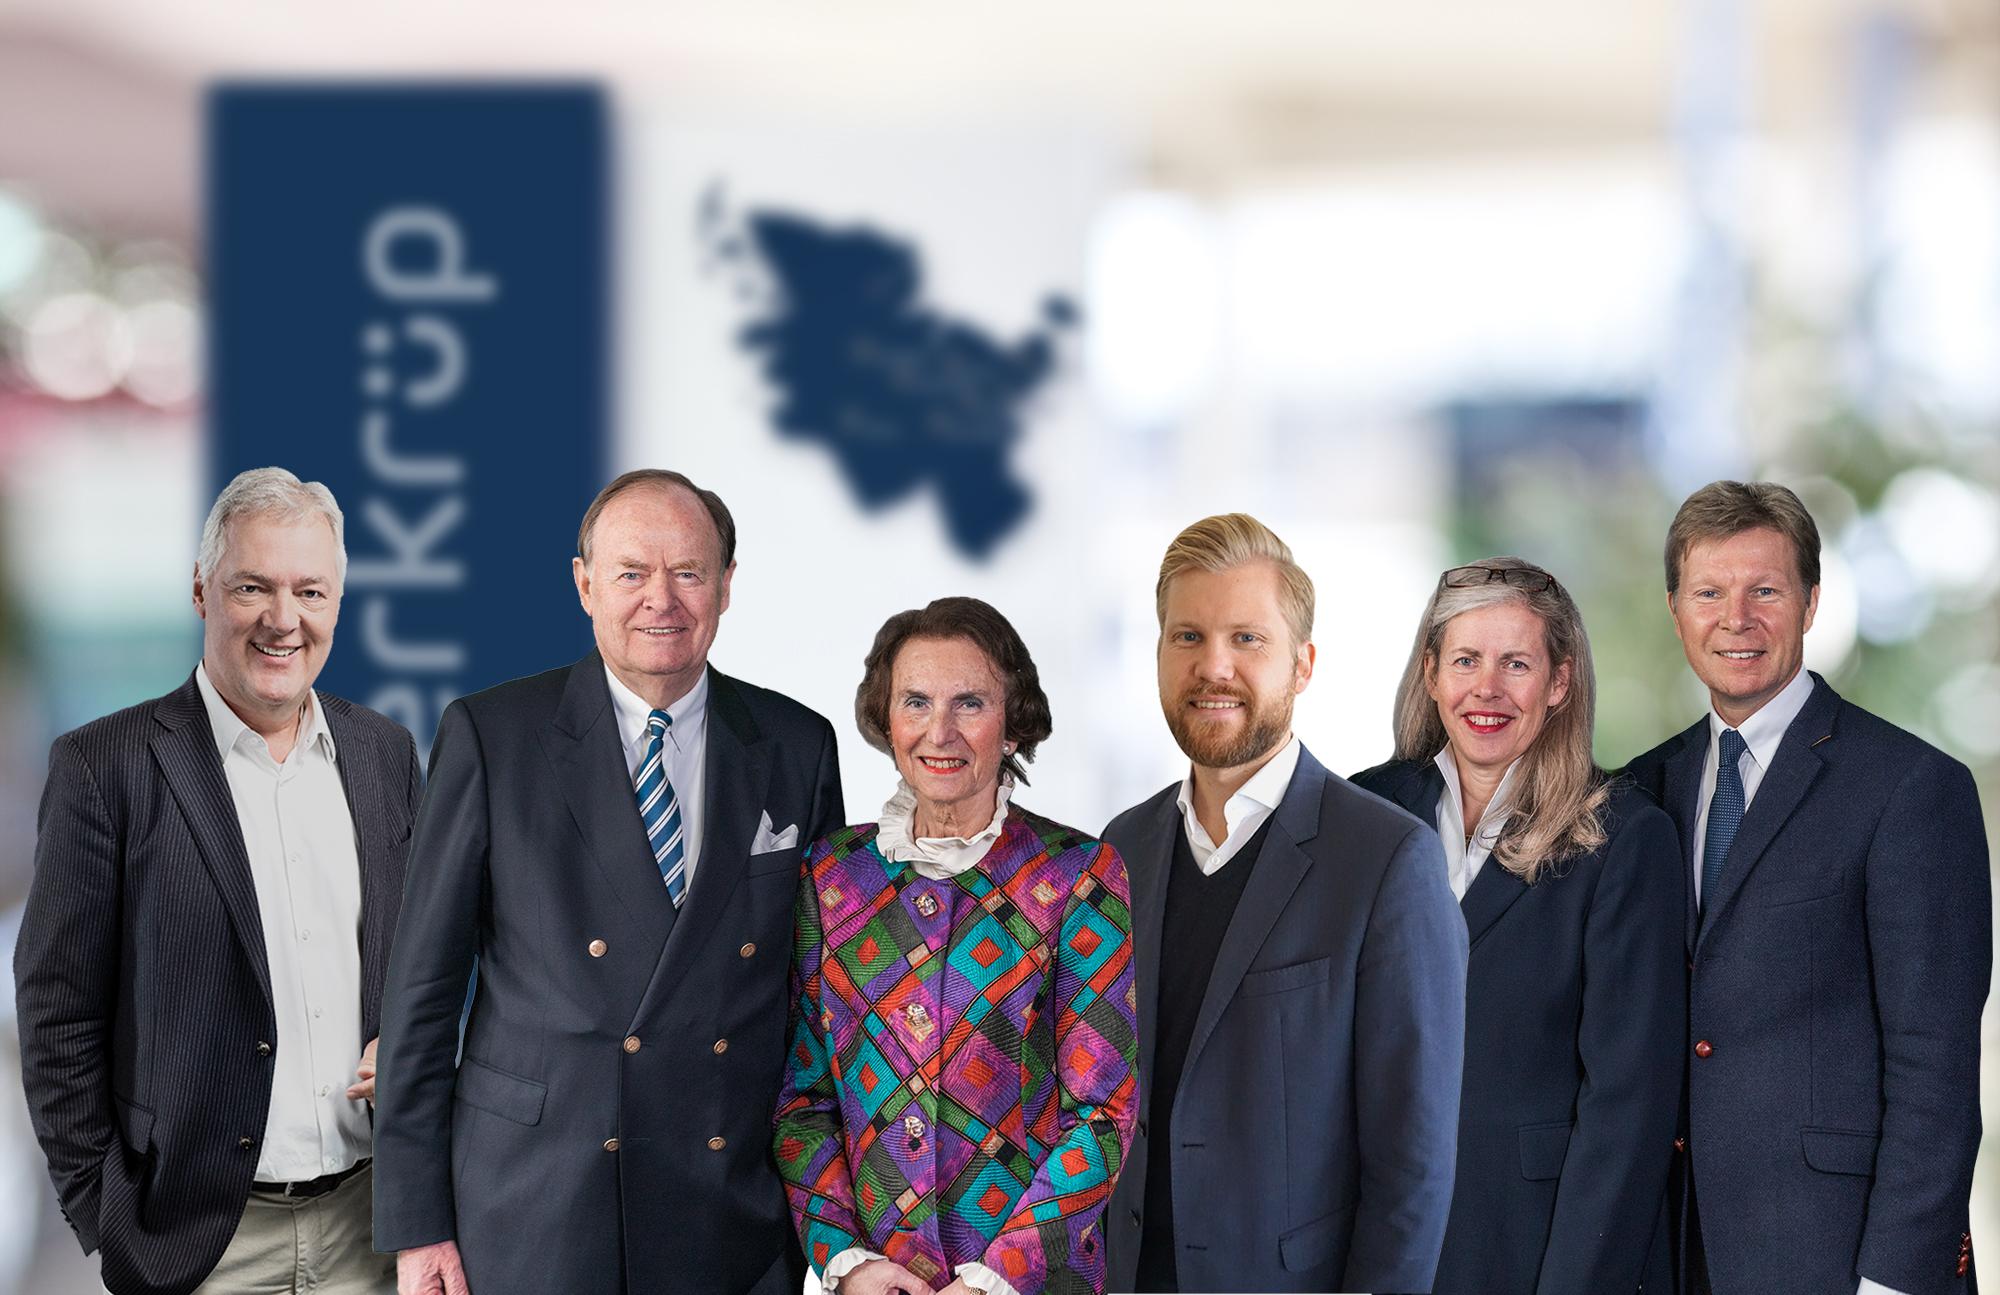 Historie Süverkrüp Niemann Automobile Familie Geschäftsführung